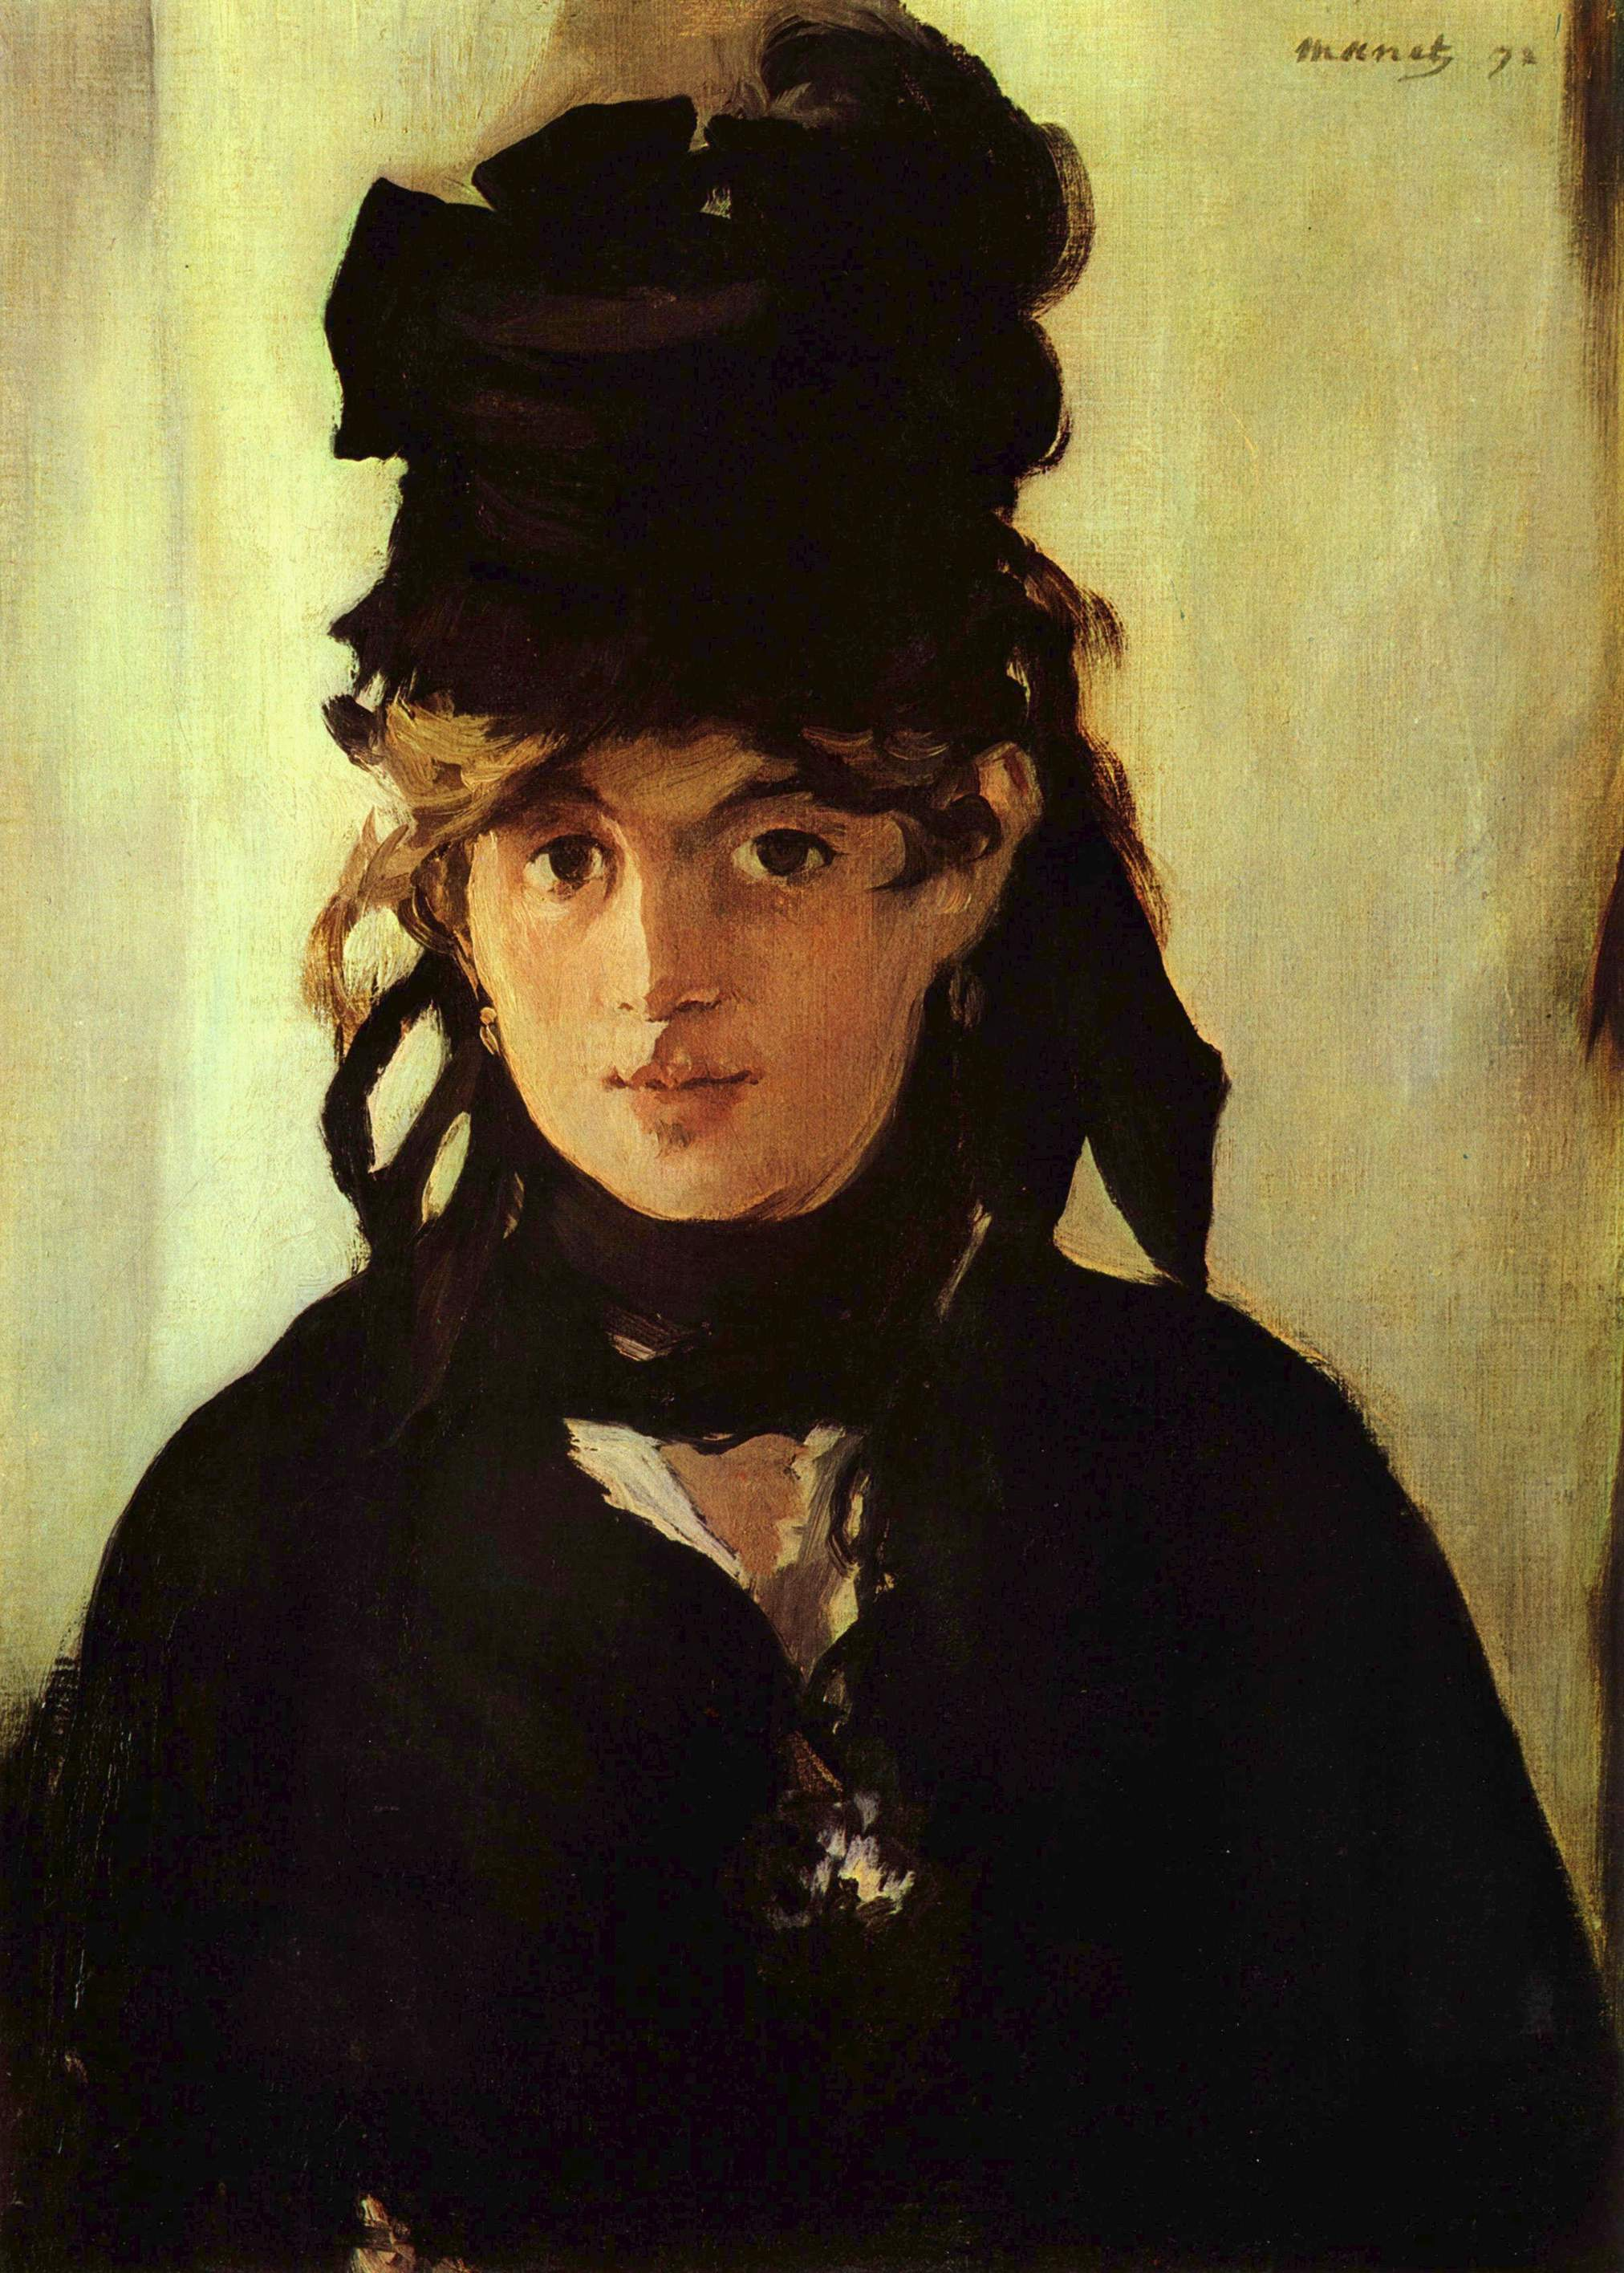 Manet, Portrait of Berthe Morisot